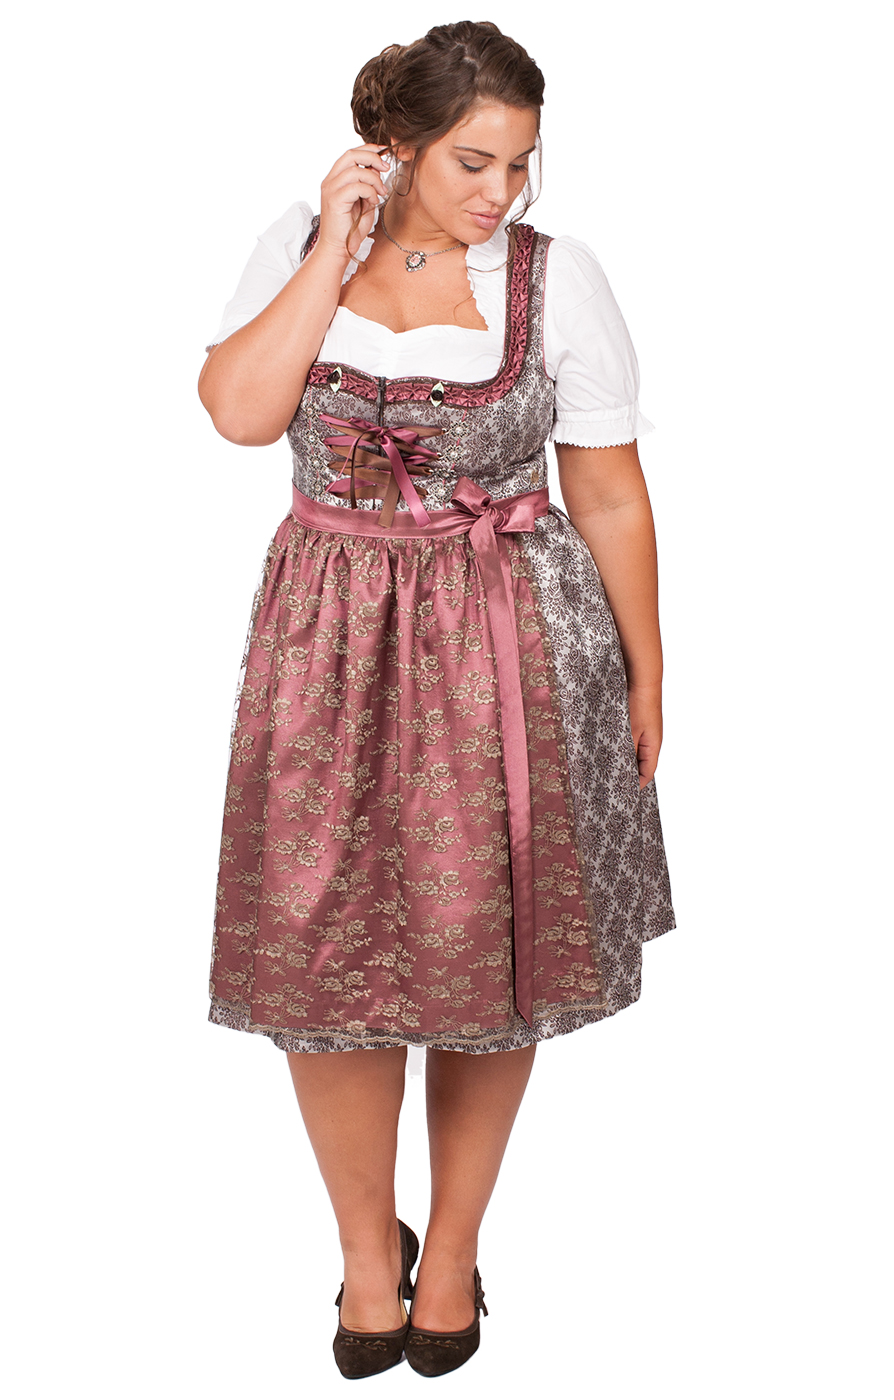 Mididirndl Ravina 2tlg. 65cm PLUS SIZE braun rosenholz von Marjo